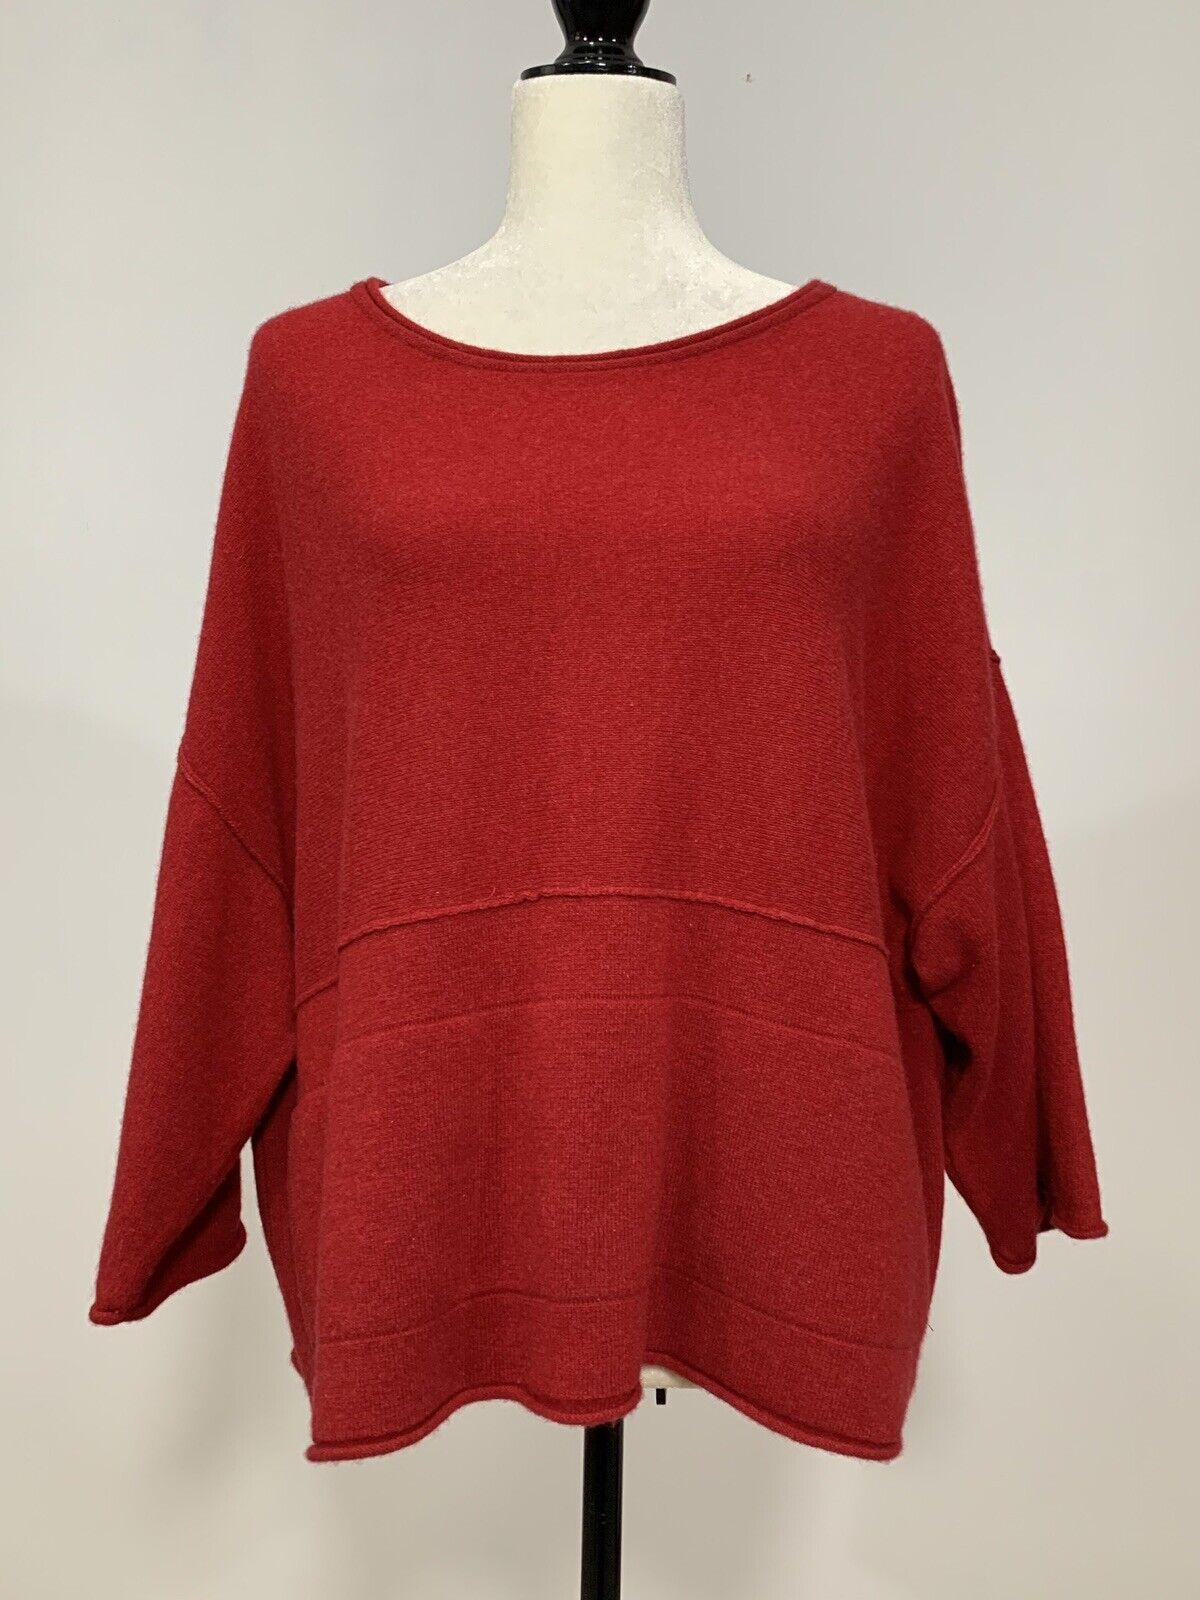 Petite red cashmere sweater — photo 1